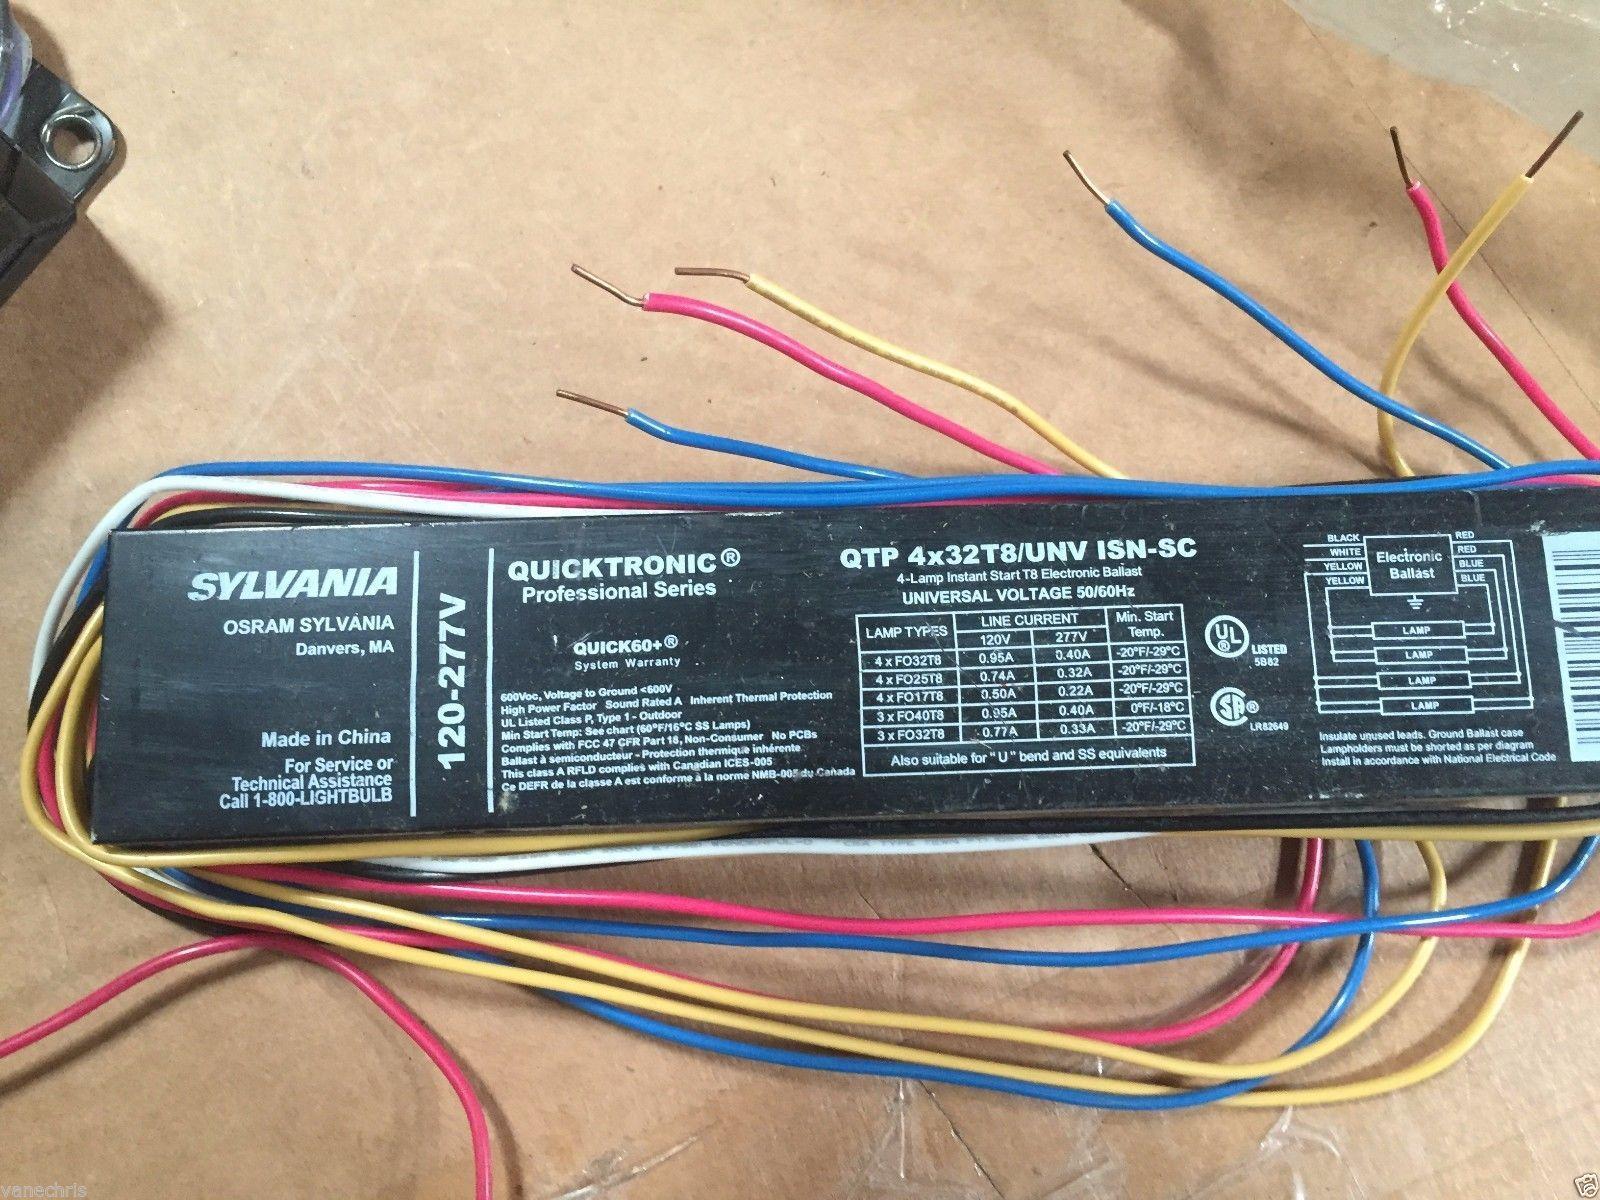 Sylvania Qt 2x32 T8 277 Isn Sc Instant Start And 50 Similar Items Osram Ballast Wiring Diagram 277v For 2 Fo32 Lamps